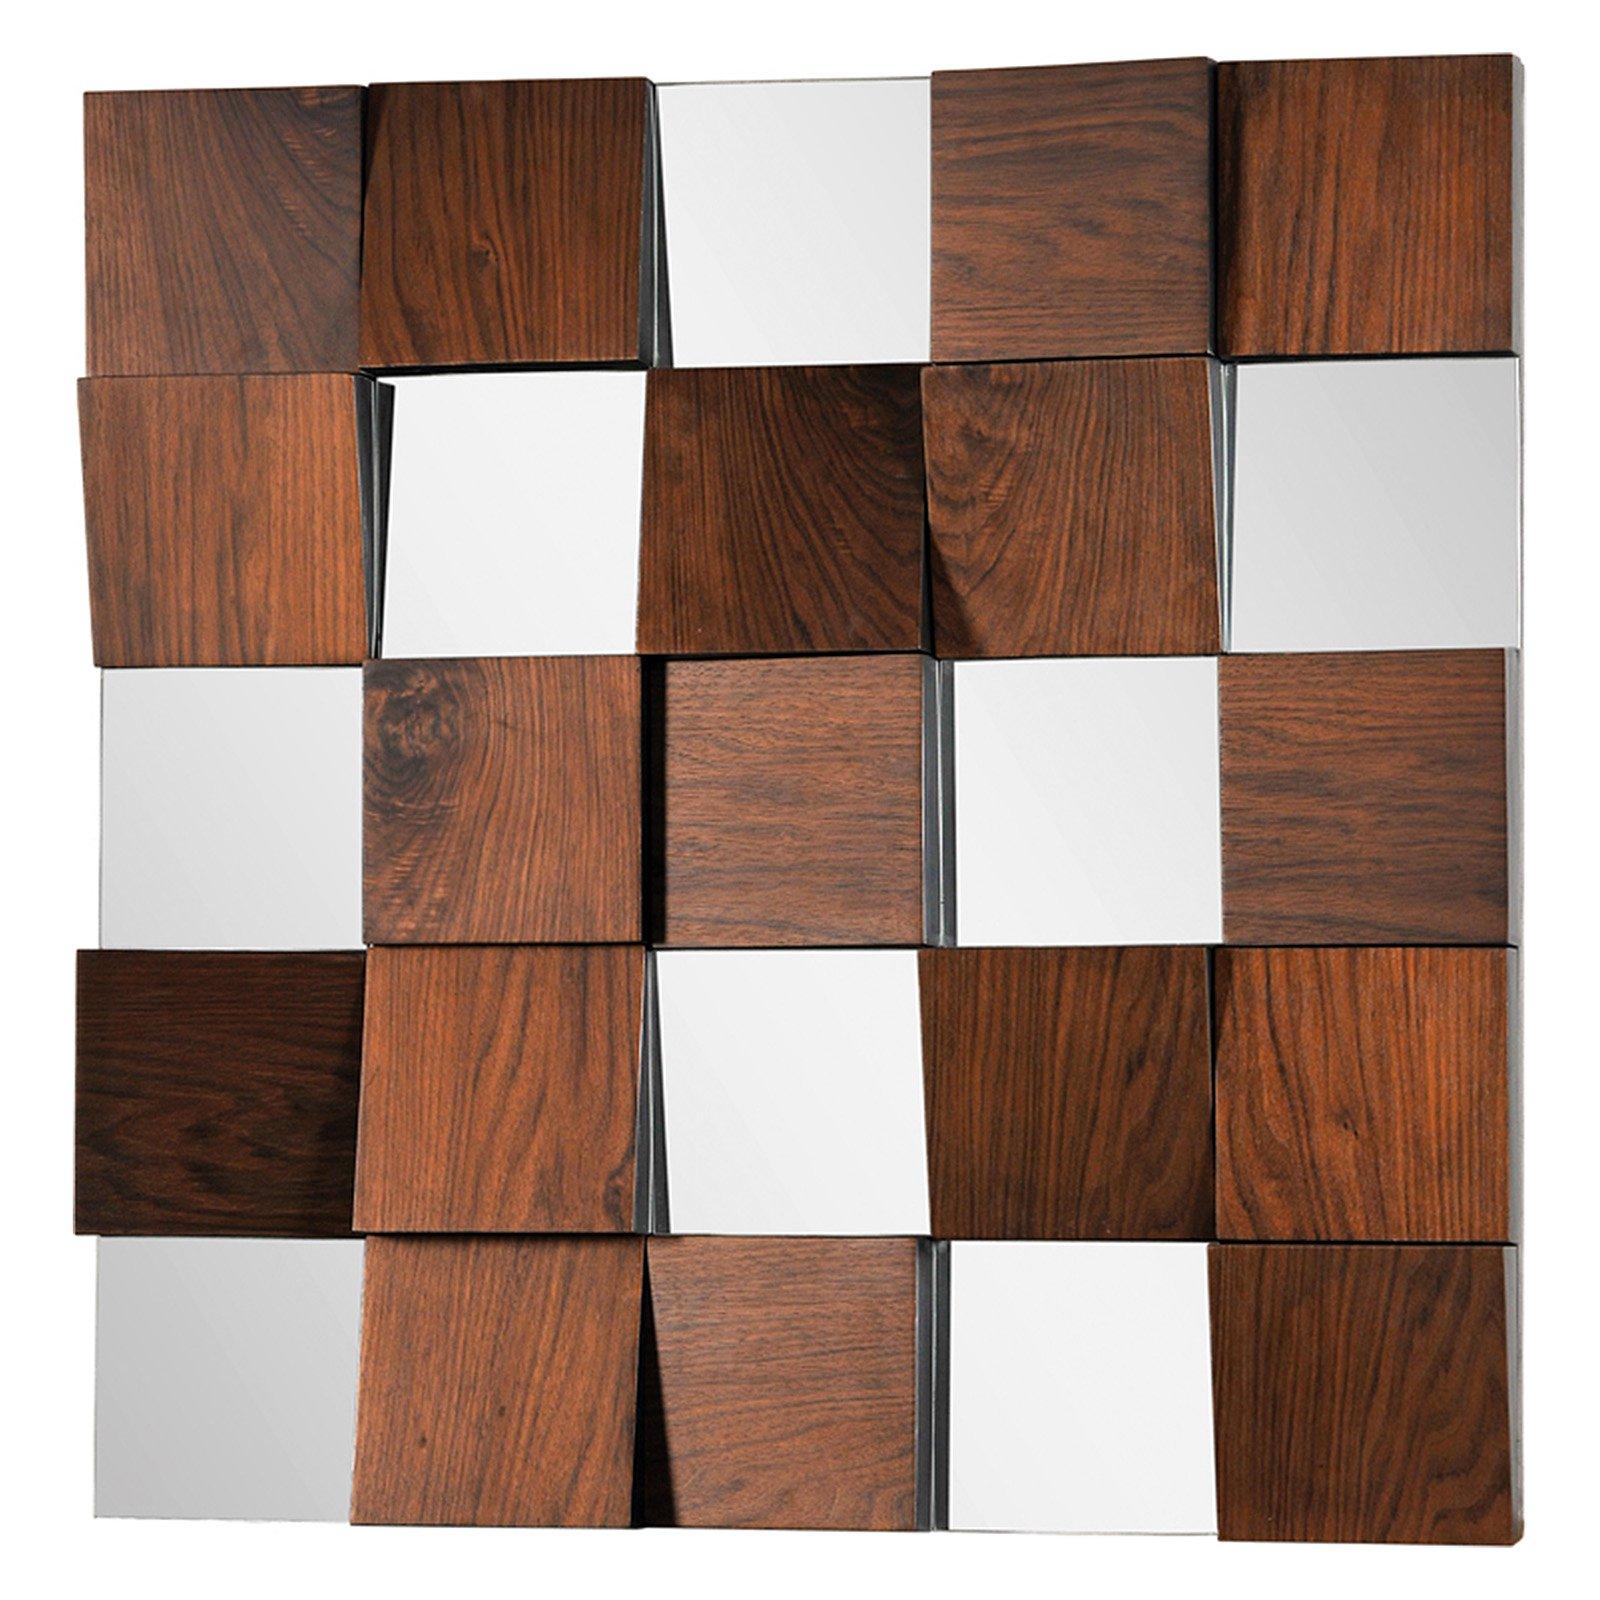 Ren Wil Wall Mirror With Walnut Veneer Panels – 36W X 36H In (View 16 of 20)